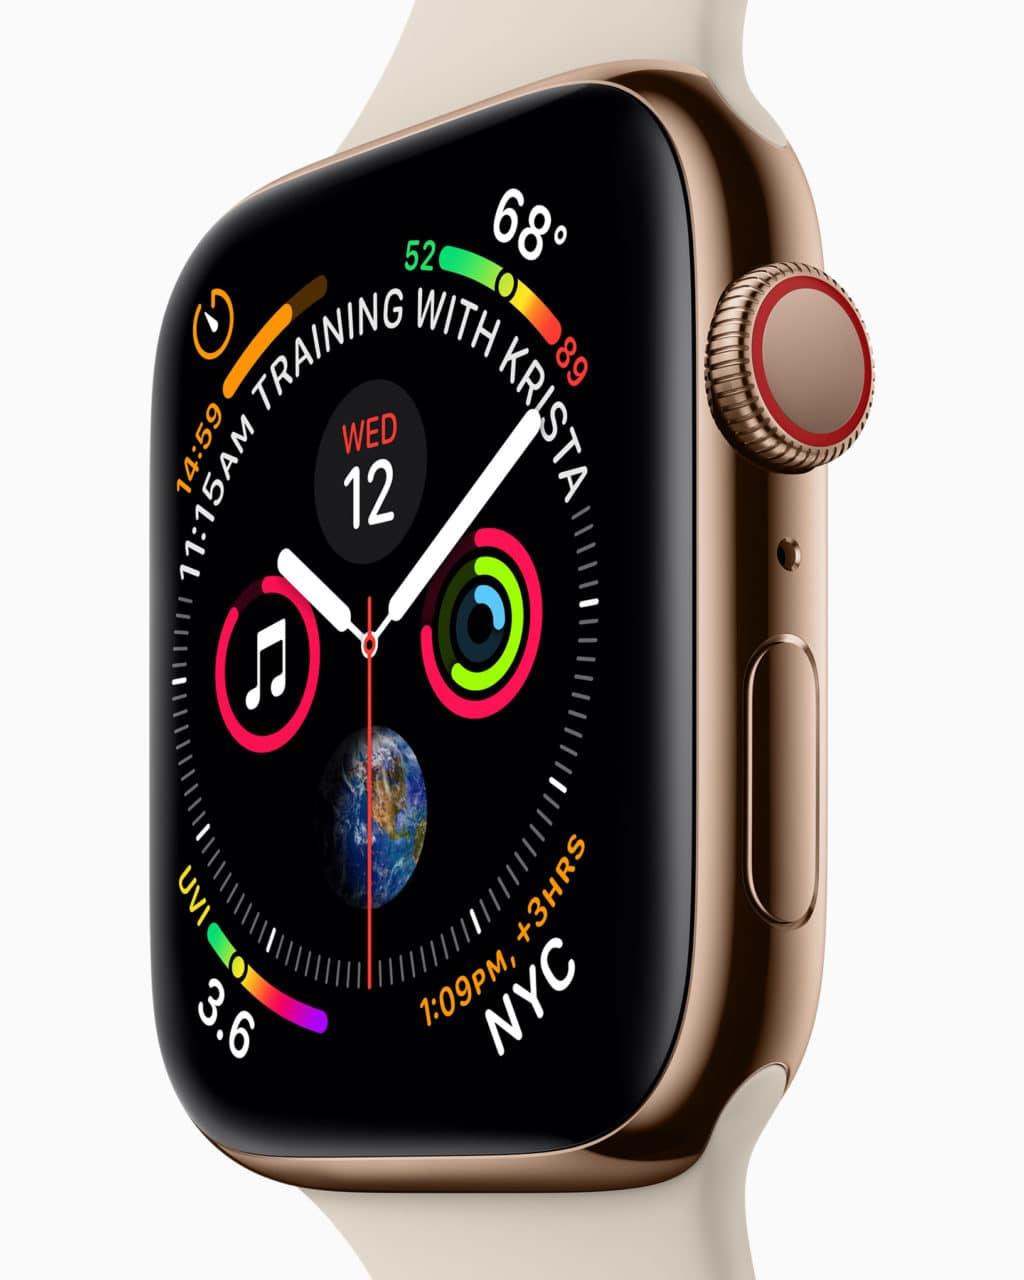 novidades do apple watch